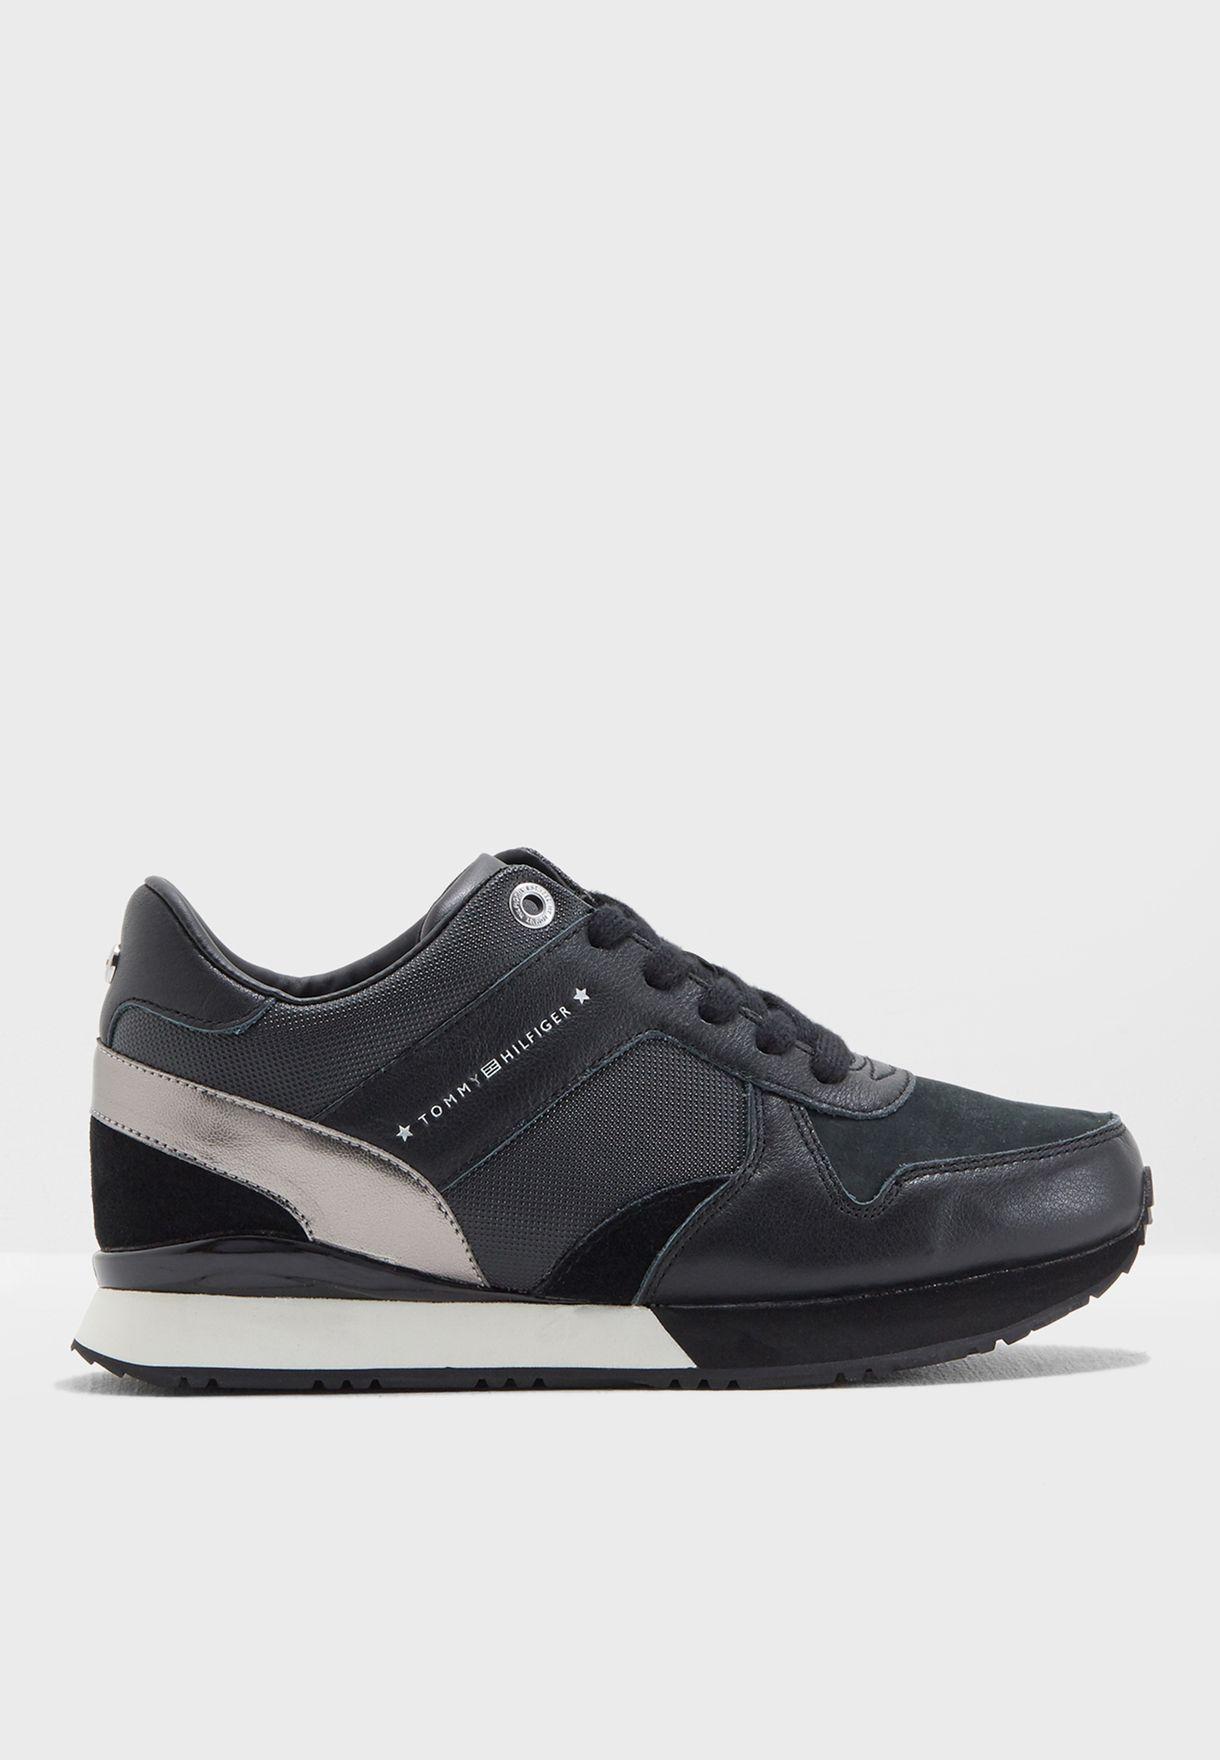 e8e63d2cc Shop Tommy Hilfiger black Sneaker Wedge FW0FW02977 for Women in ...